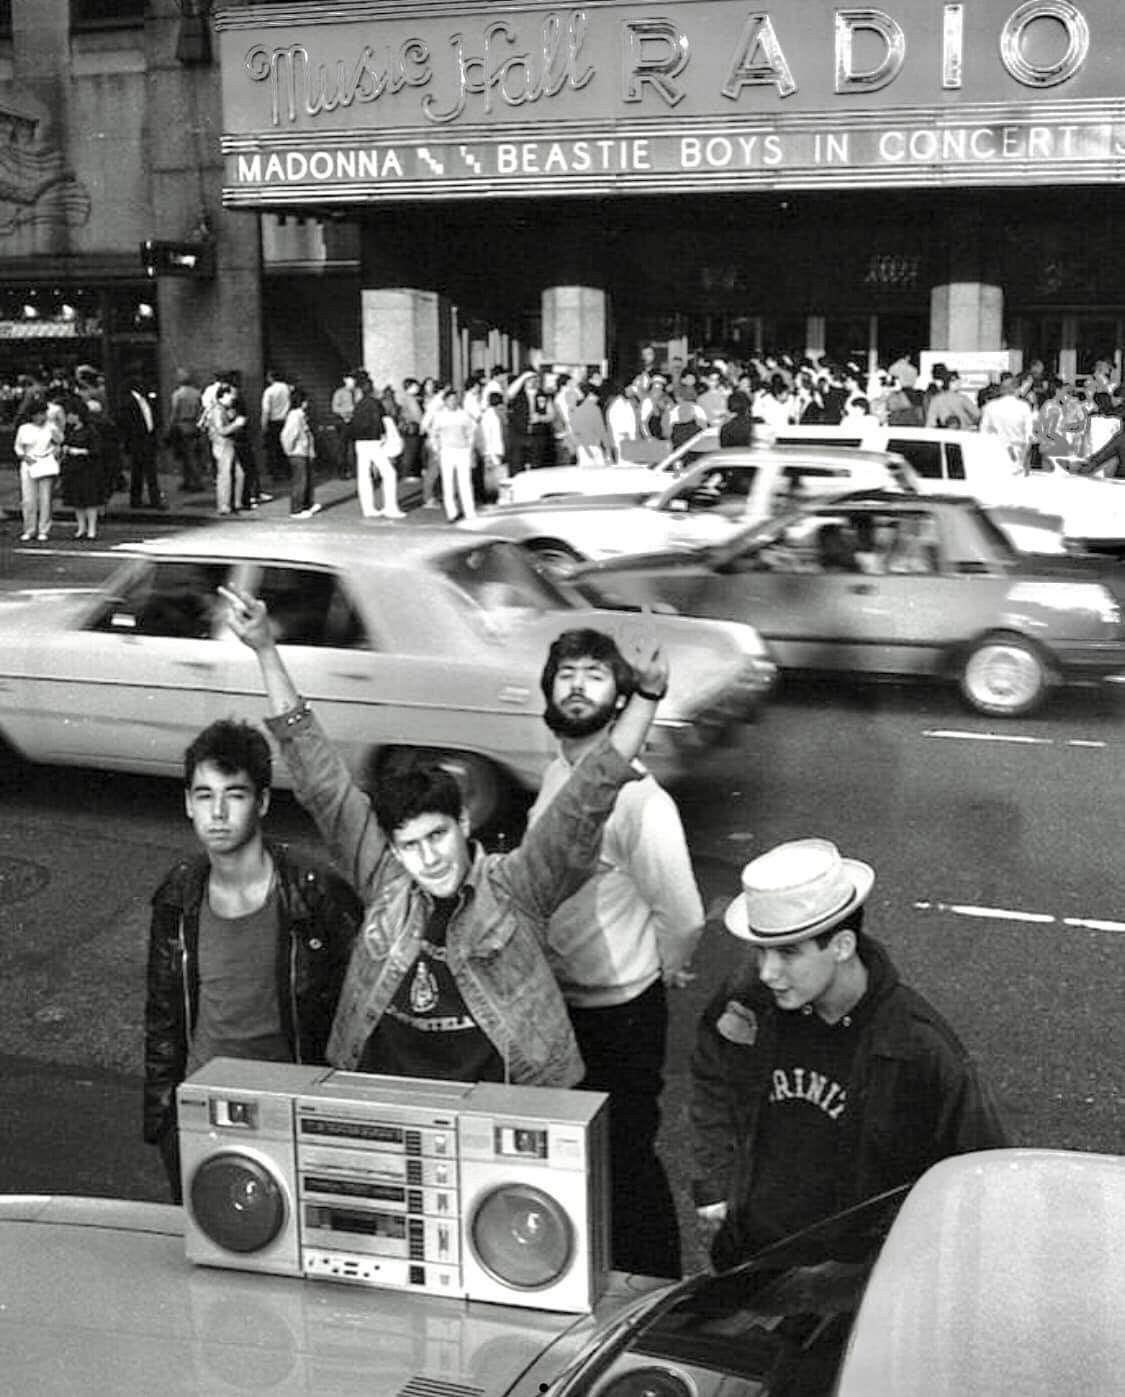 Beastie Boys + Madonna | Beastie boys, Old school radio, Songs